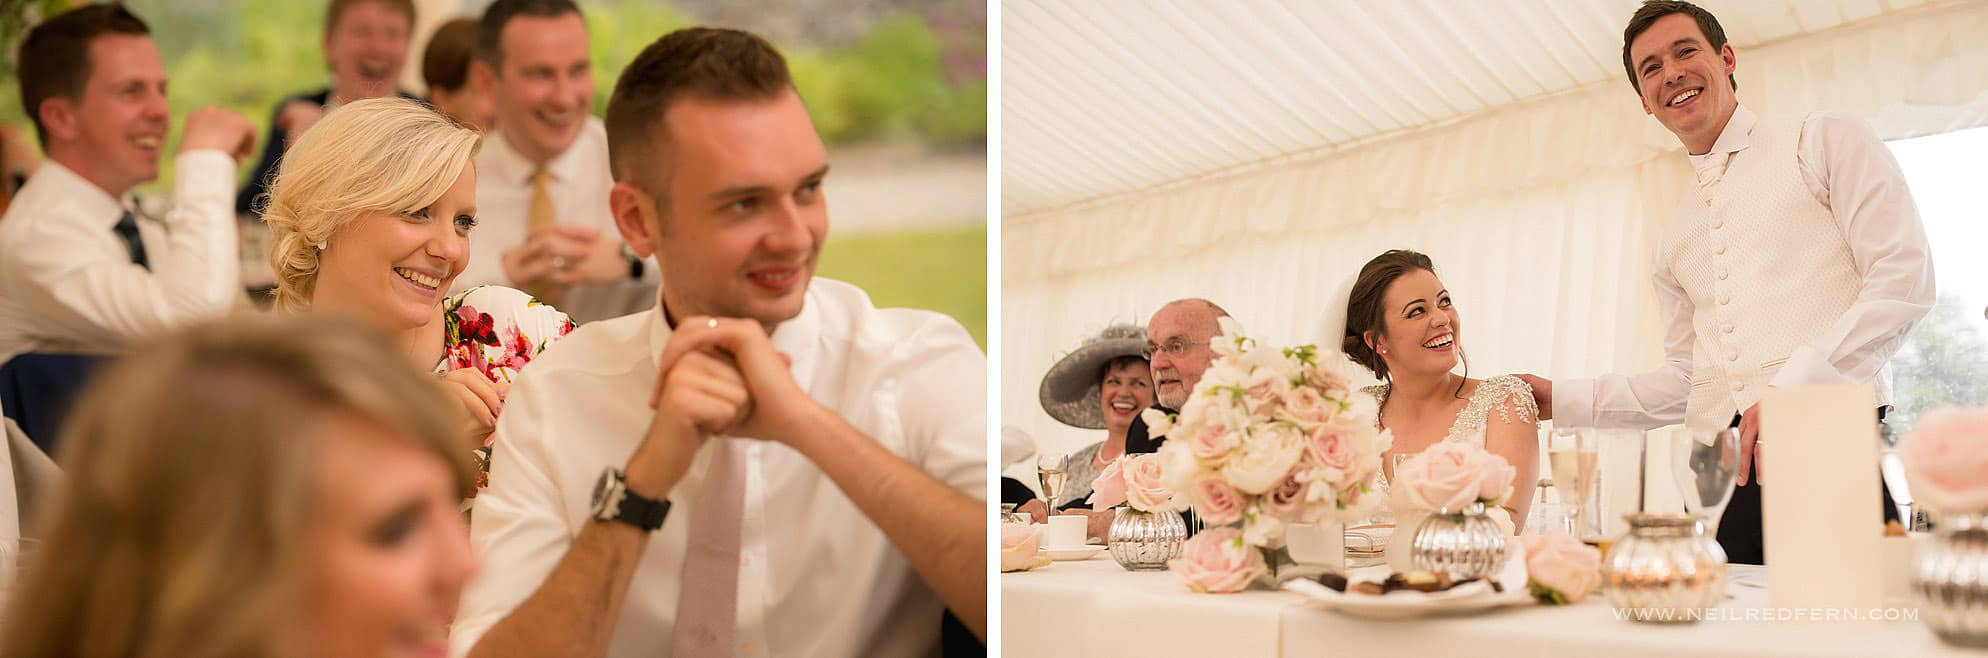 Cragwood Hotel wedding photographs 11